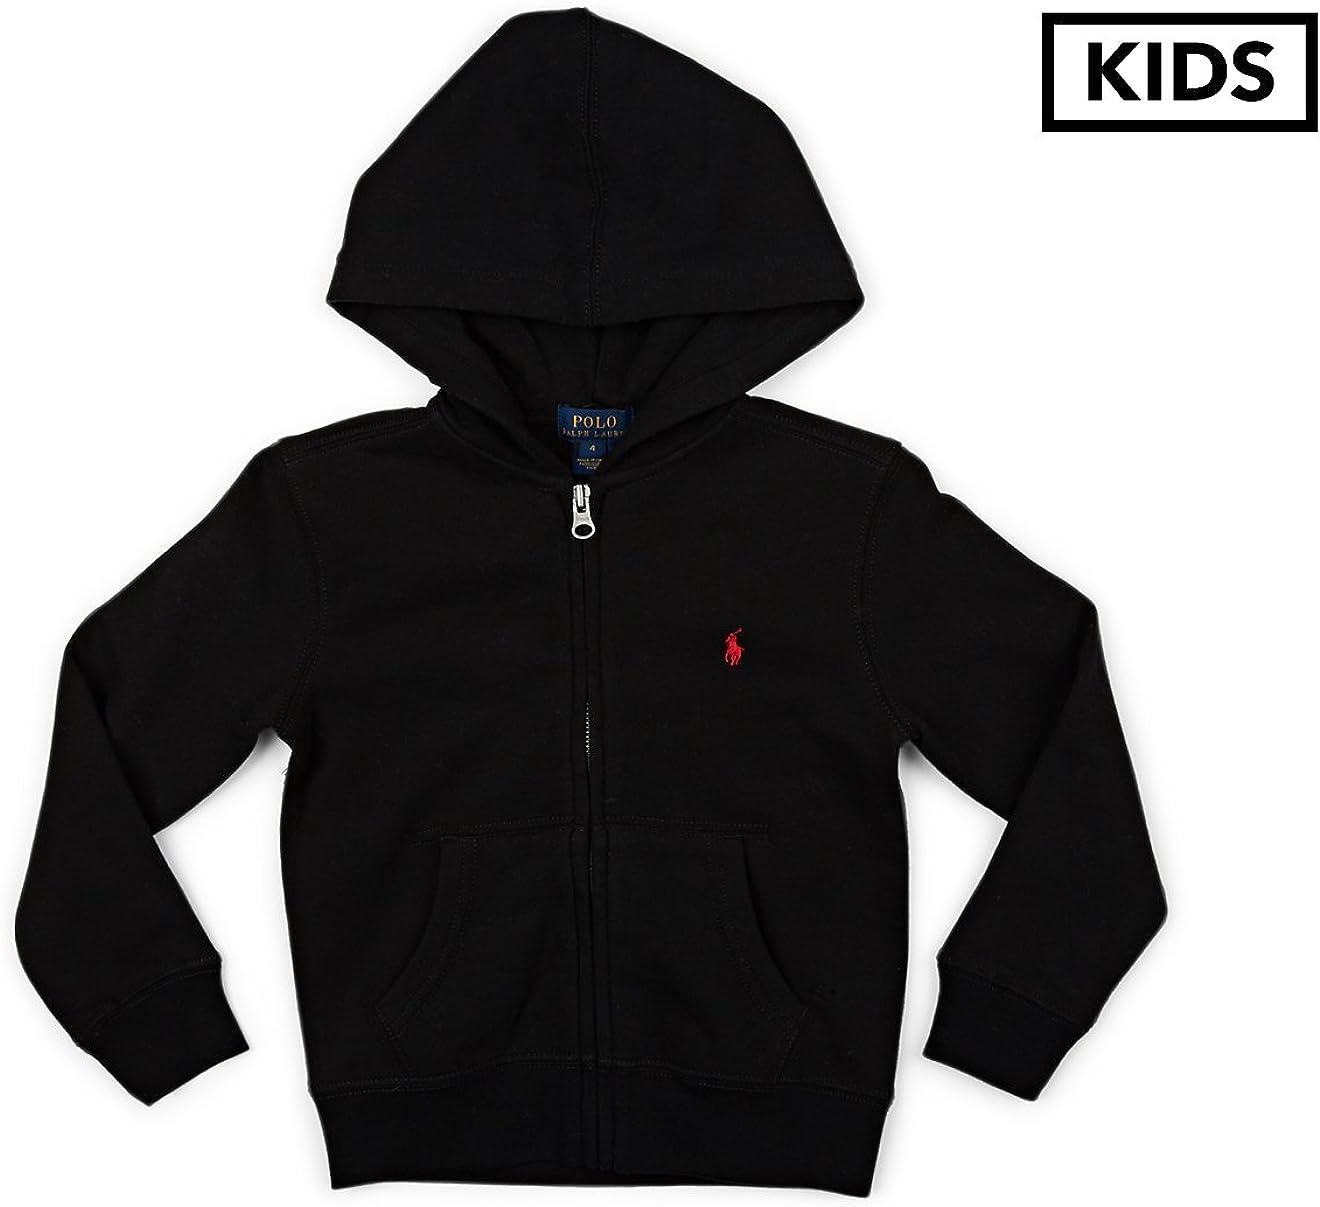 Polo Ralph Lauren Kids Collection Fleece Full-Zip Hoodie Little Kids Polo Black Boy's Fleece